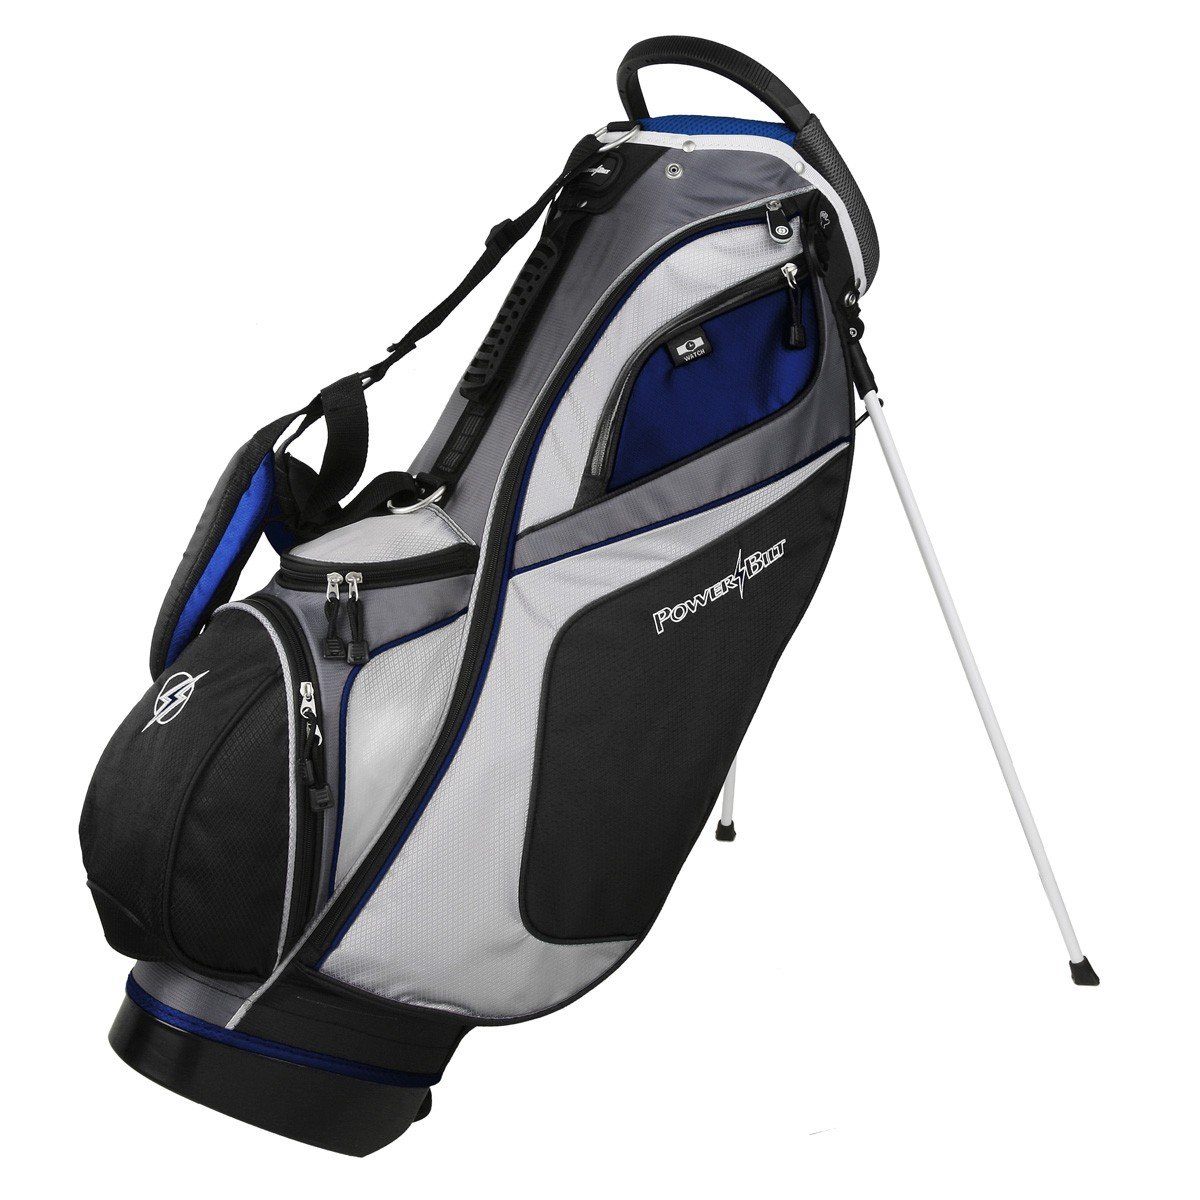 Amazon.com : Powerbilt TPS Dunes 14 Way Black/Black Stand Golf Bag (Black)  : Sports U0026 Outdoors